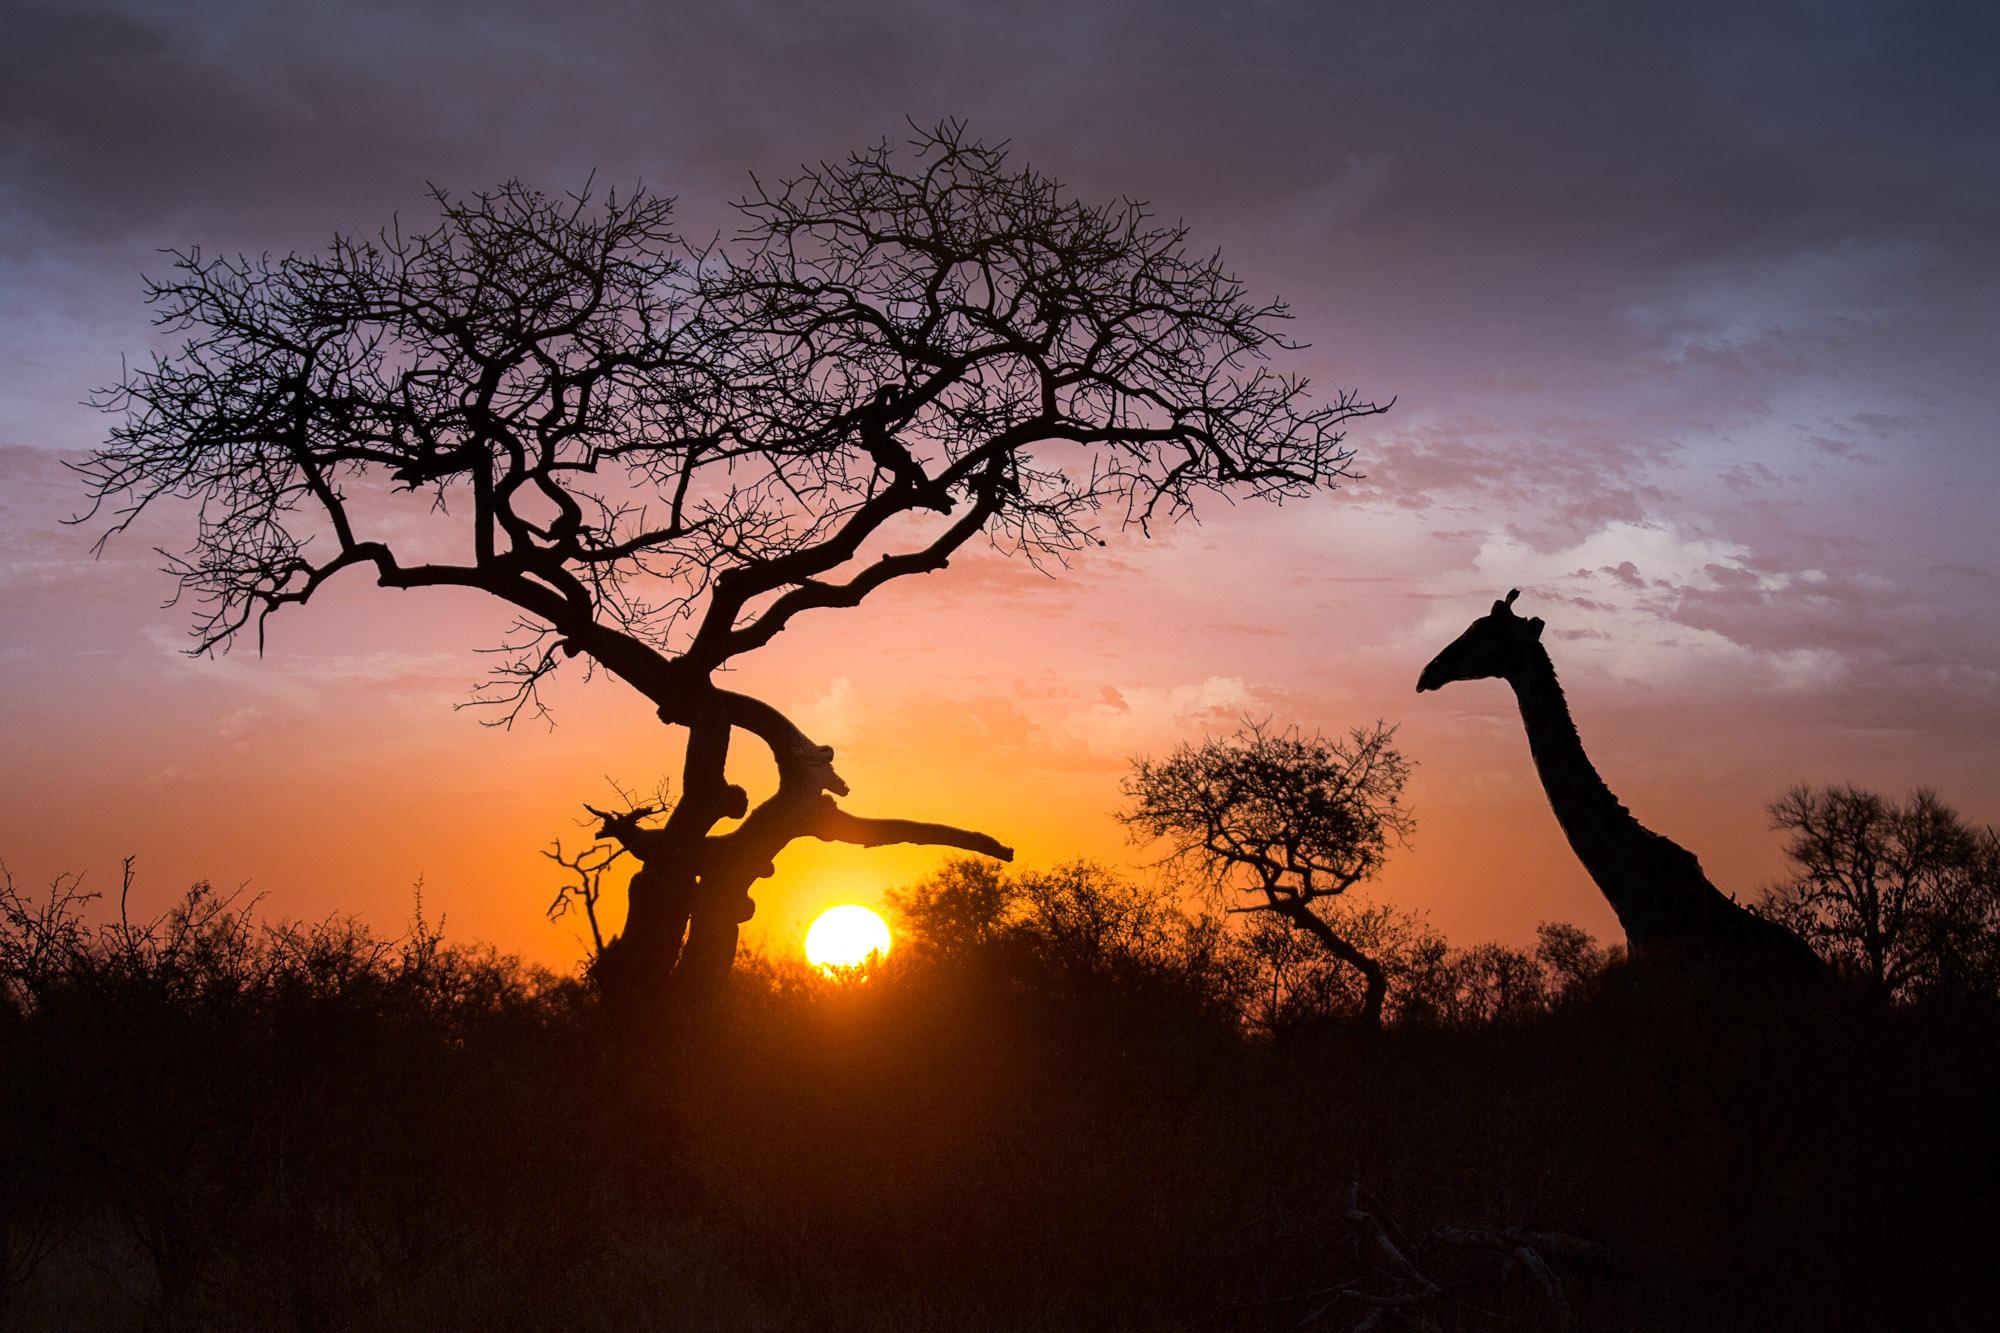 Giraffe and Tree Silhouette